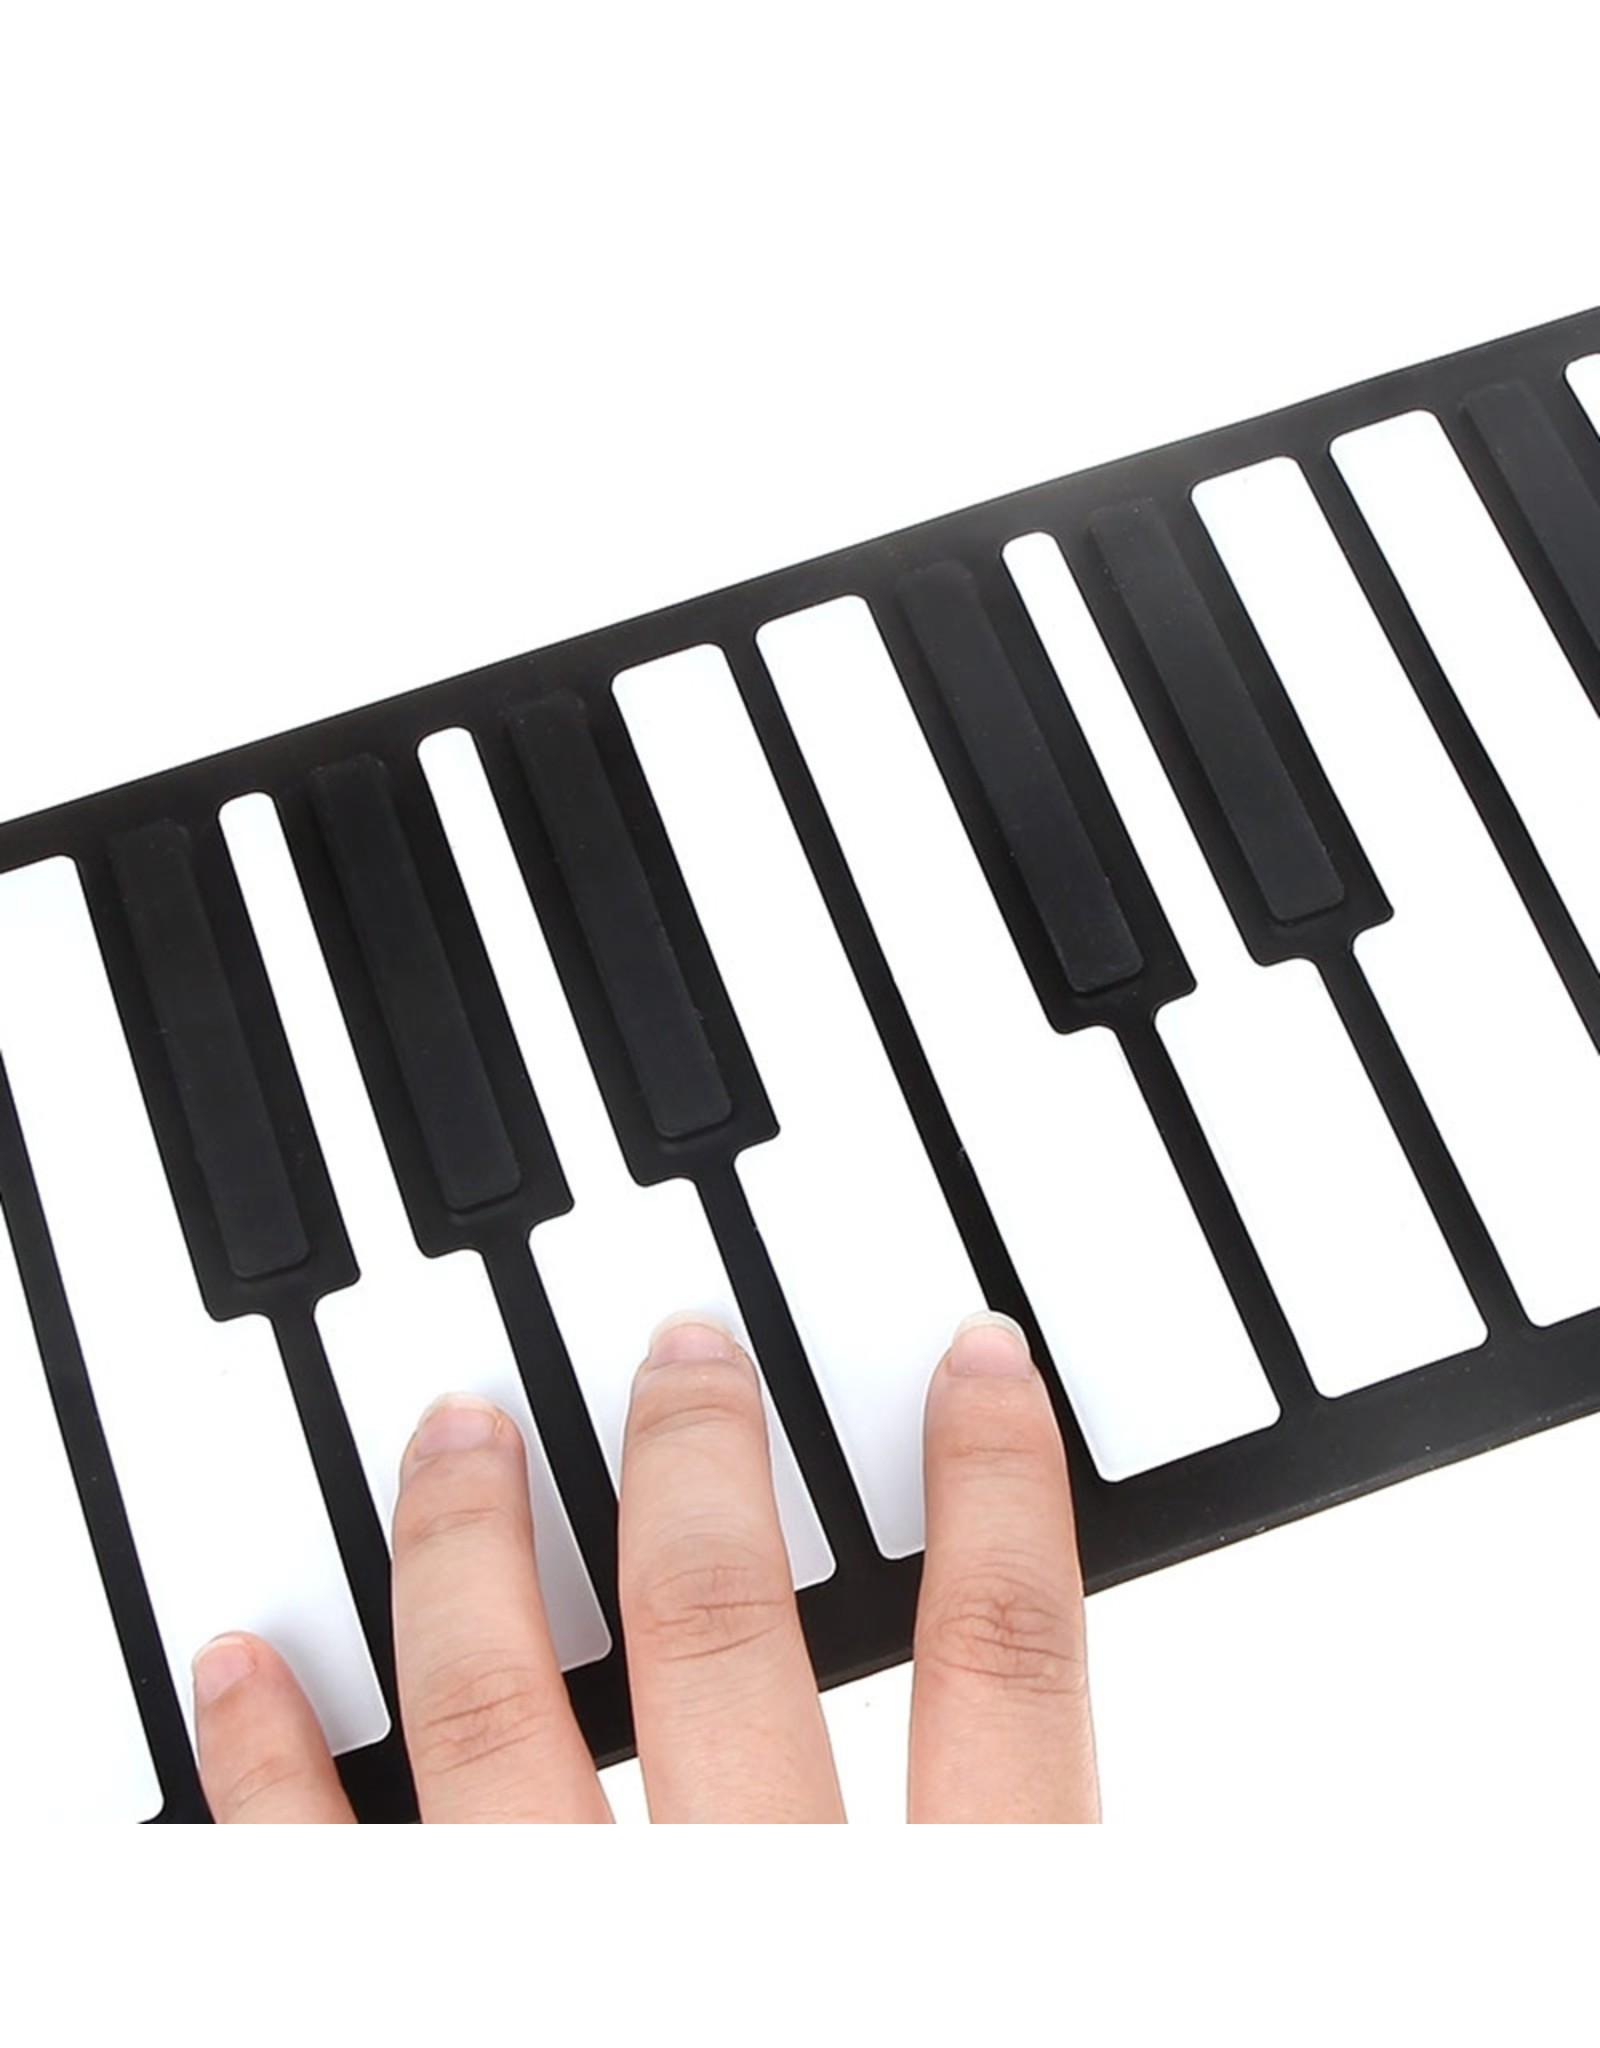 Parya Official Parya Official - Electric Piano Keys - 88 keys - Foldable